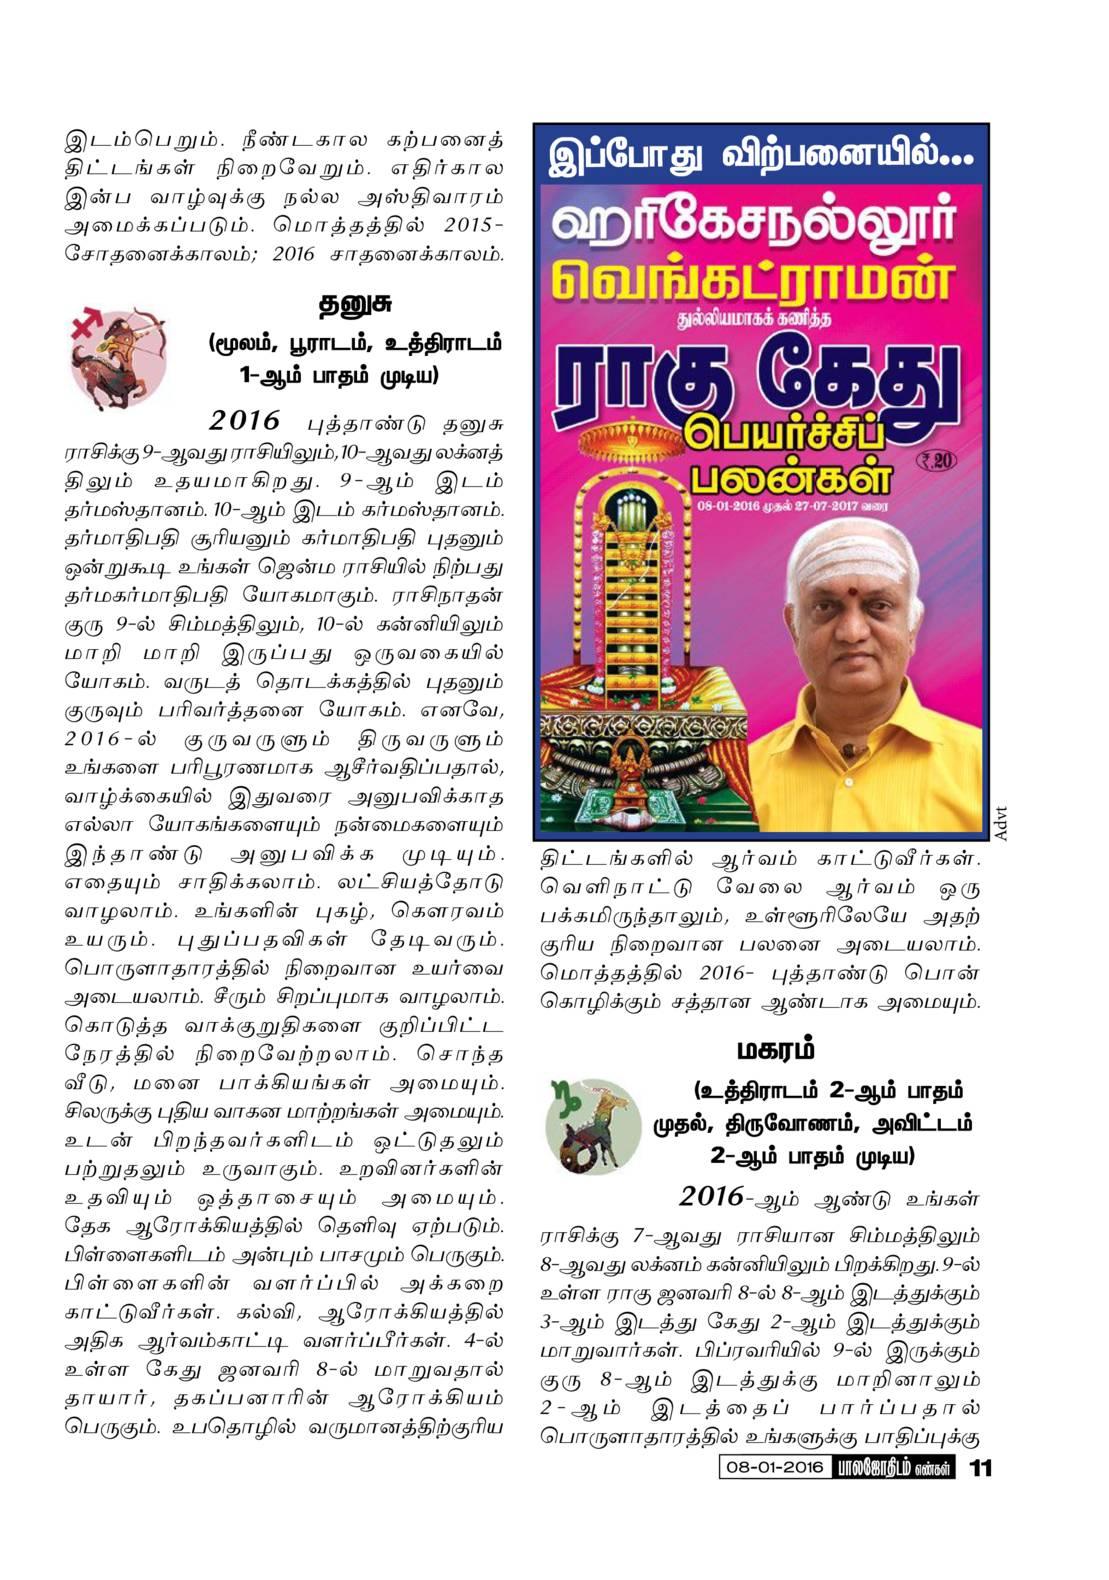 2016 New Year Rasi Palan by Astrologer Athirshdam C Subramaniam - Balajothidam